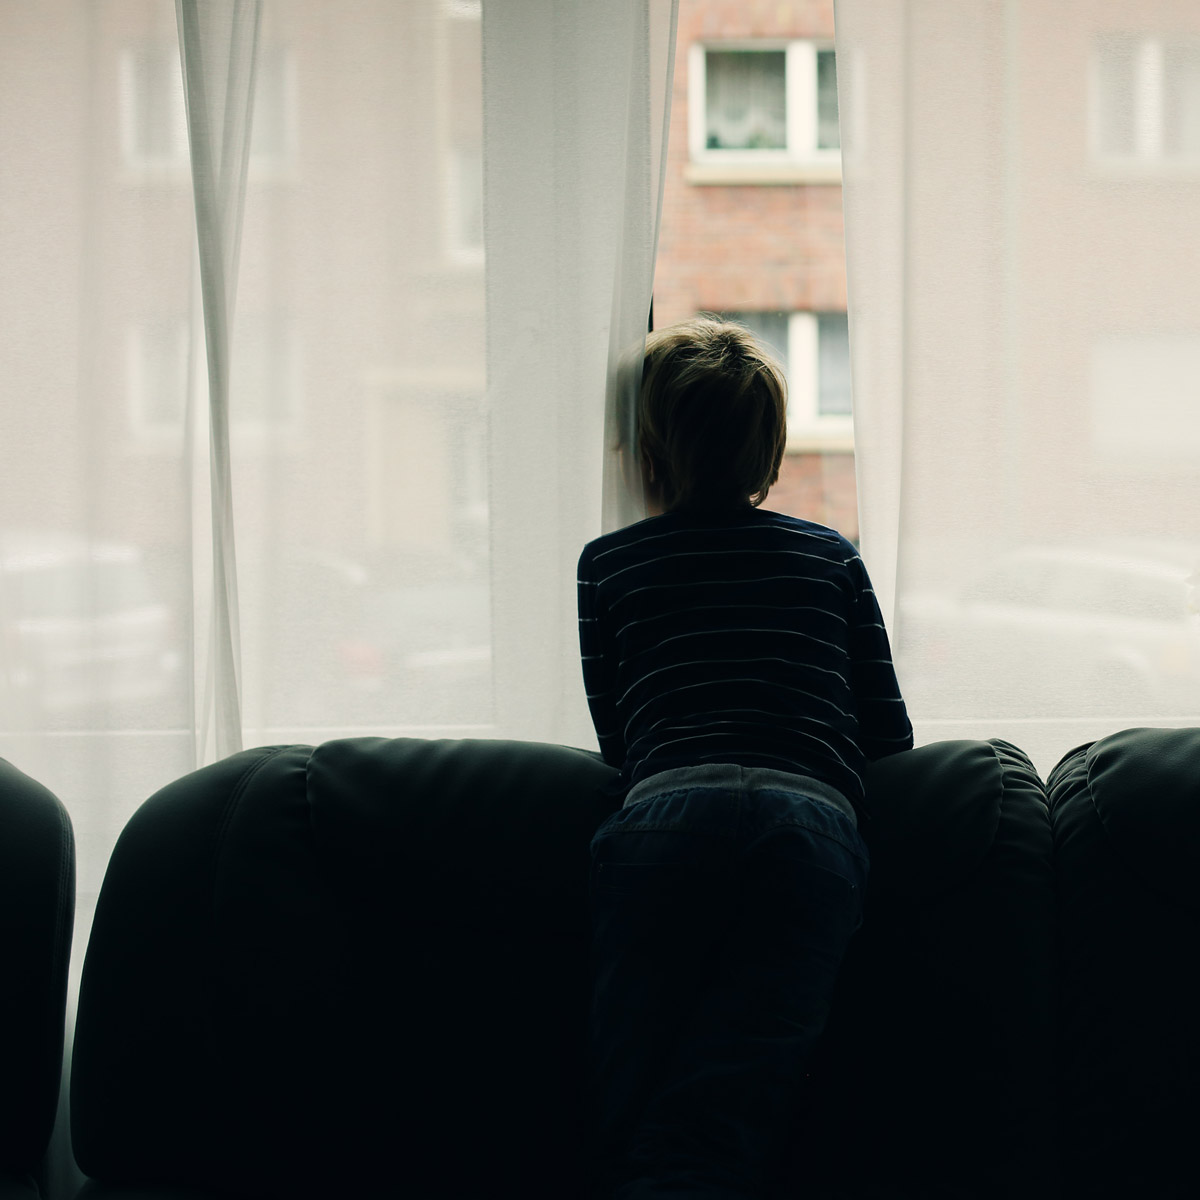 child-on-own